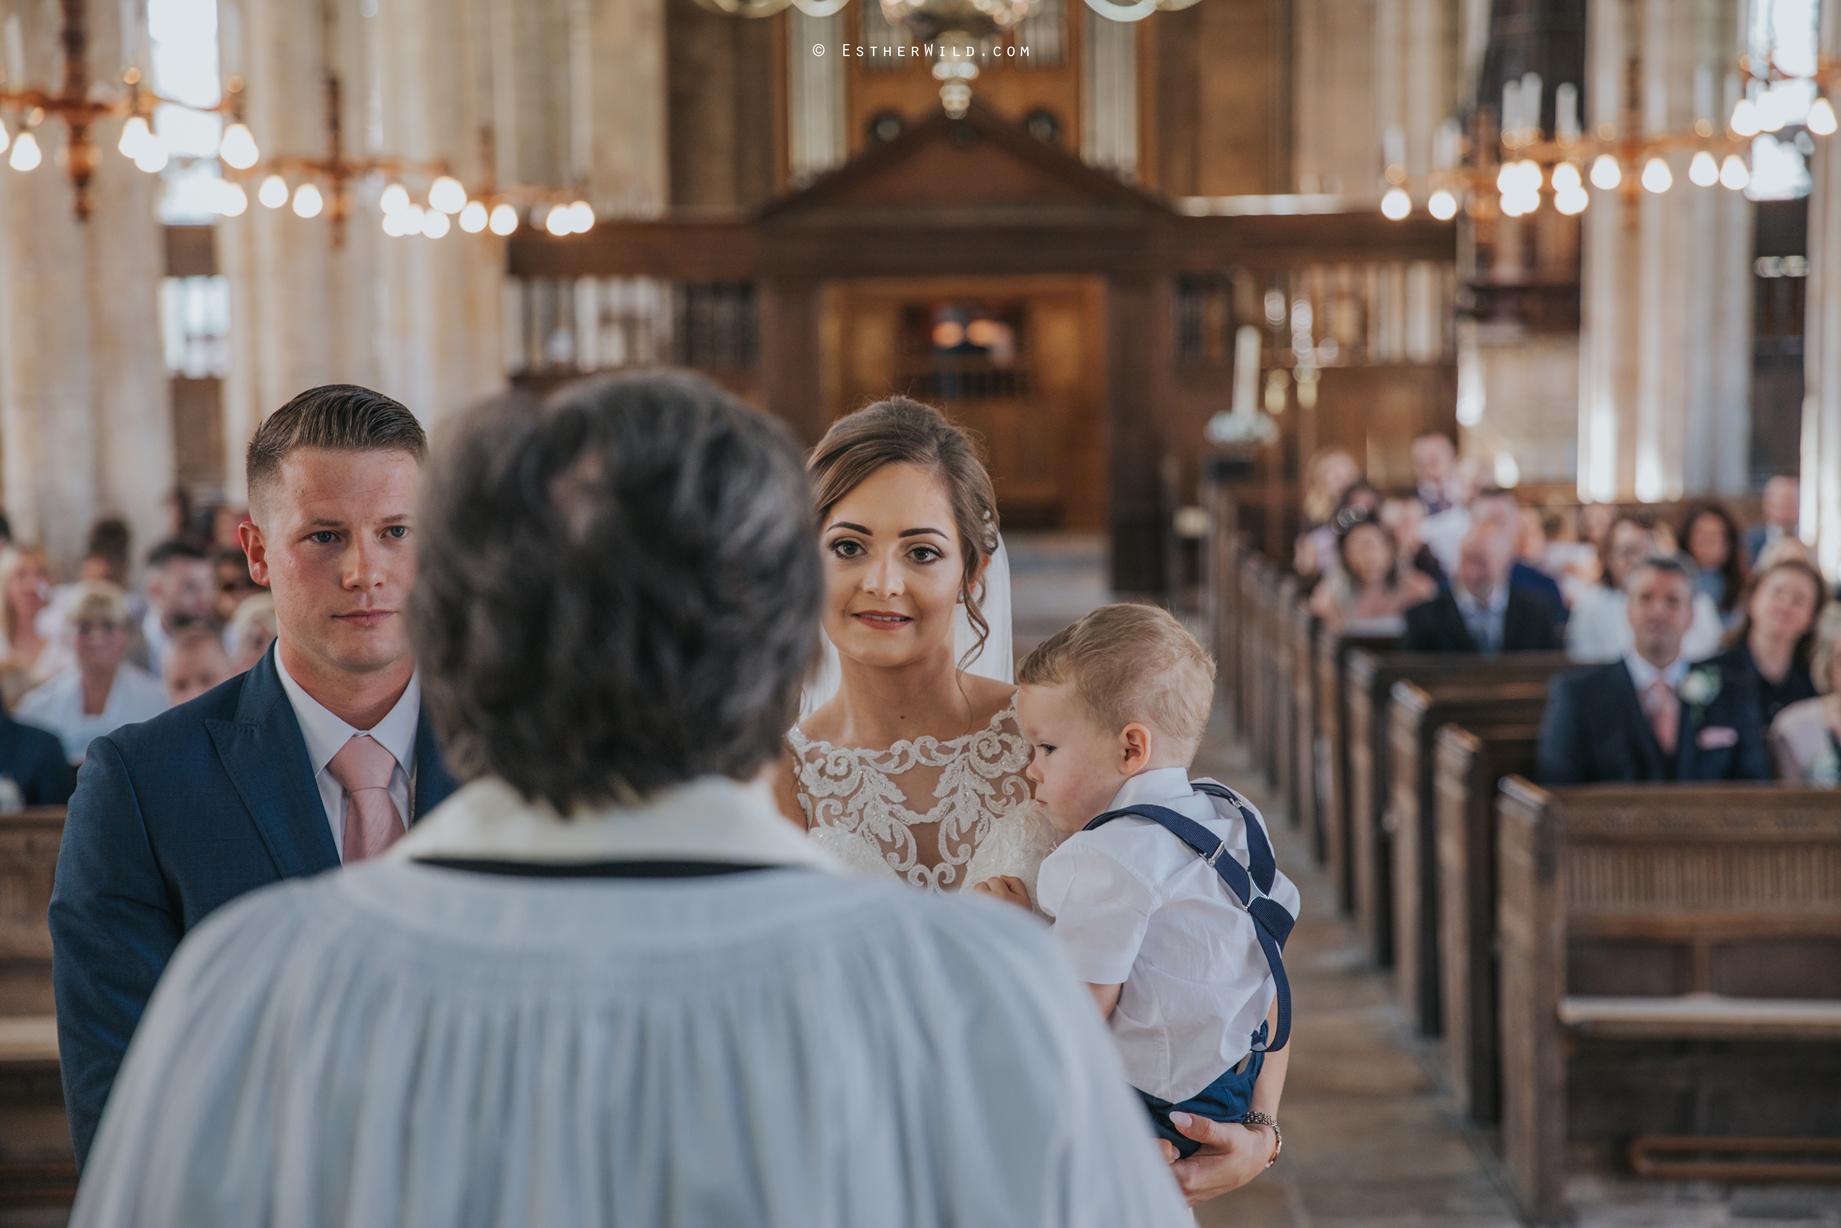 IMG_0467Walpole_St_Andrew_Church_Norfolk_Wedding_Copyright_Esther_Wild_Photographer_.jpg